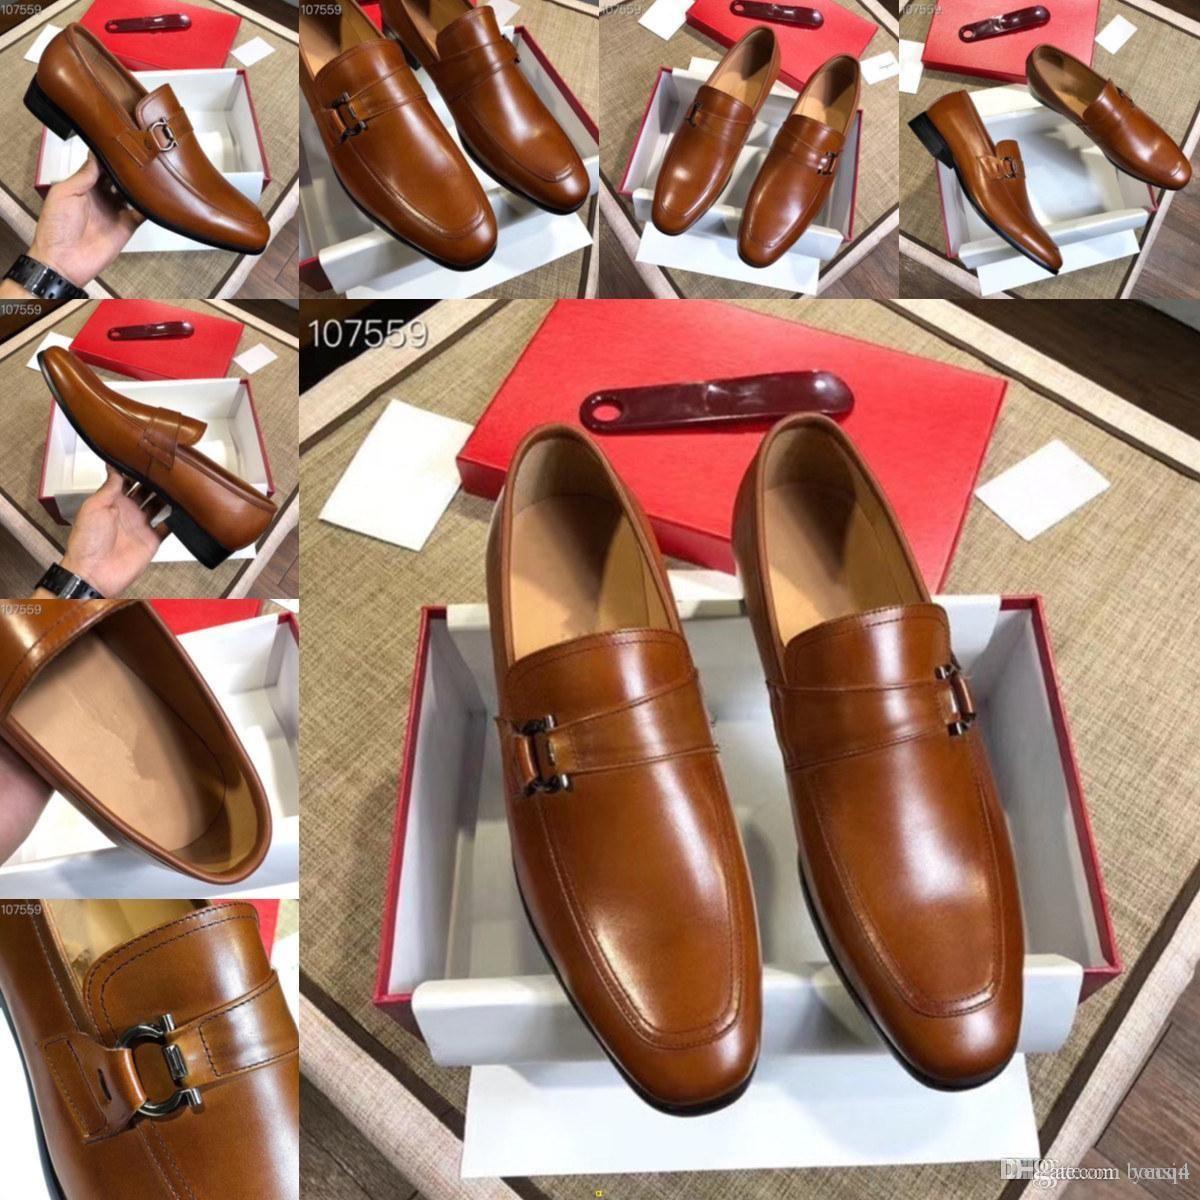 Mm chaussures officielles hommes 21ss automne mode de mariée chaussures de mariée de luxe marques robe chaussures mâle bureau Business brevet cuir chaussures 33